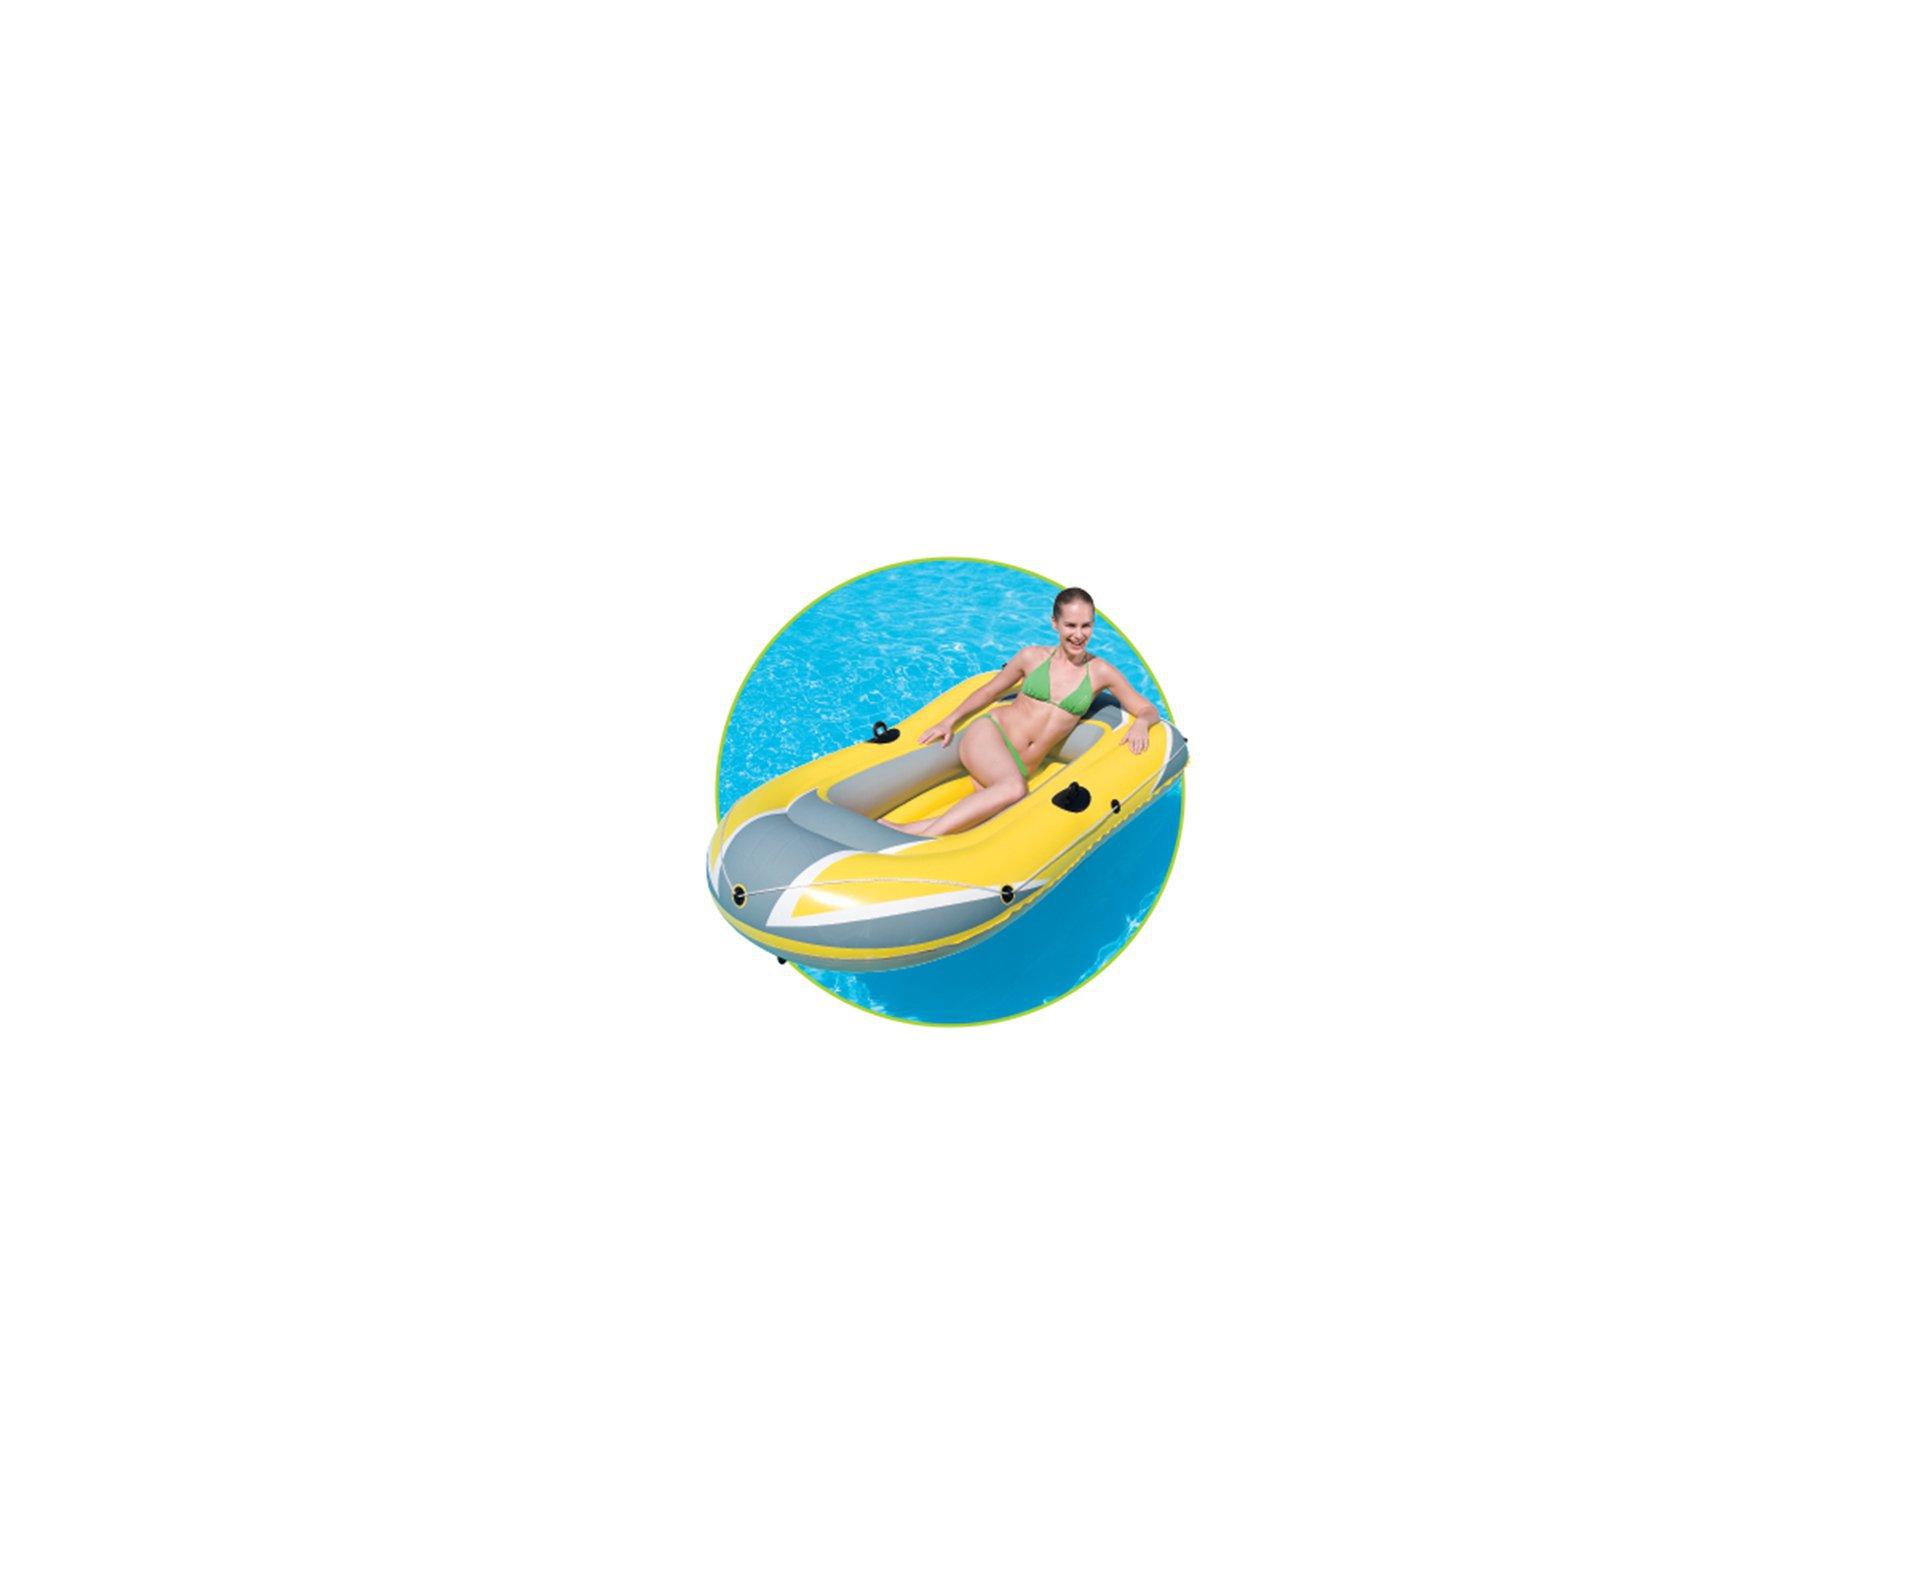 Bote Inflavel Hydro - Force Raft 1.94 X 1.10 - 2p - Echolife